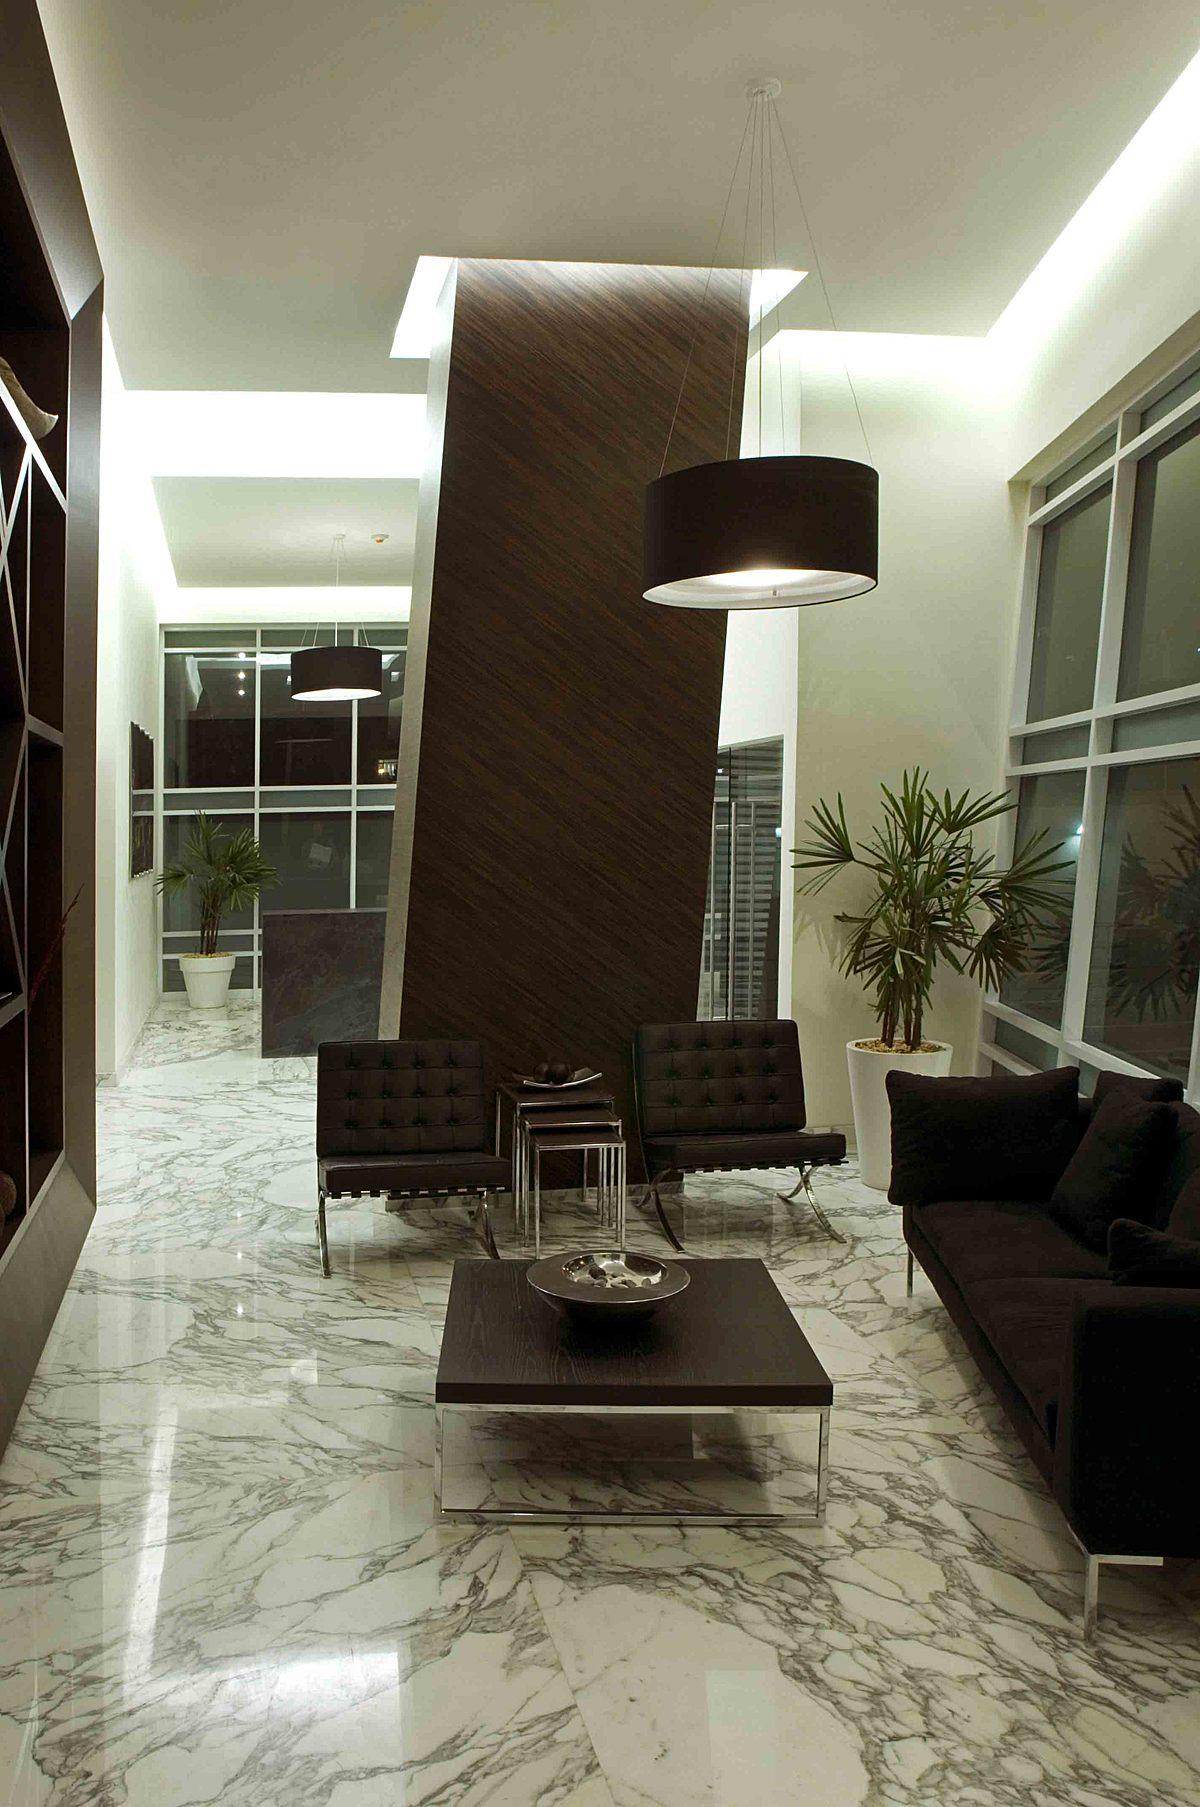 Skyview residential complex arco arquitectura for Arquitectura contemporanea